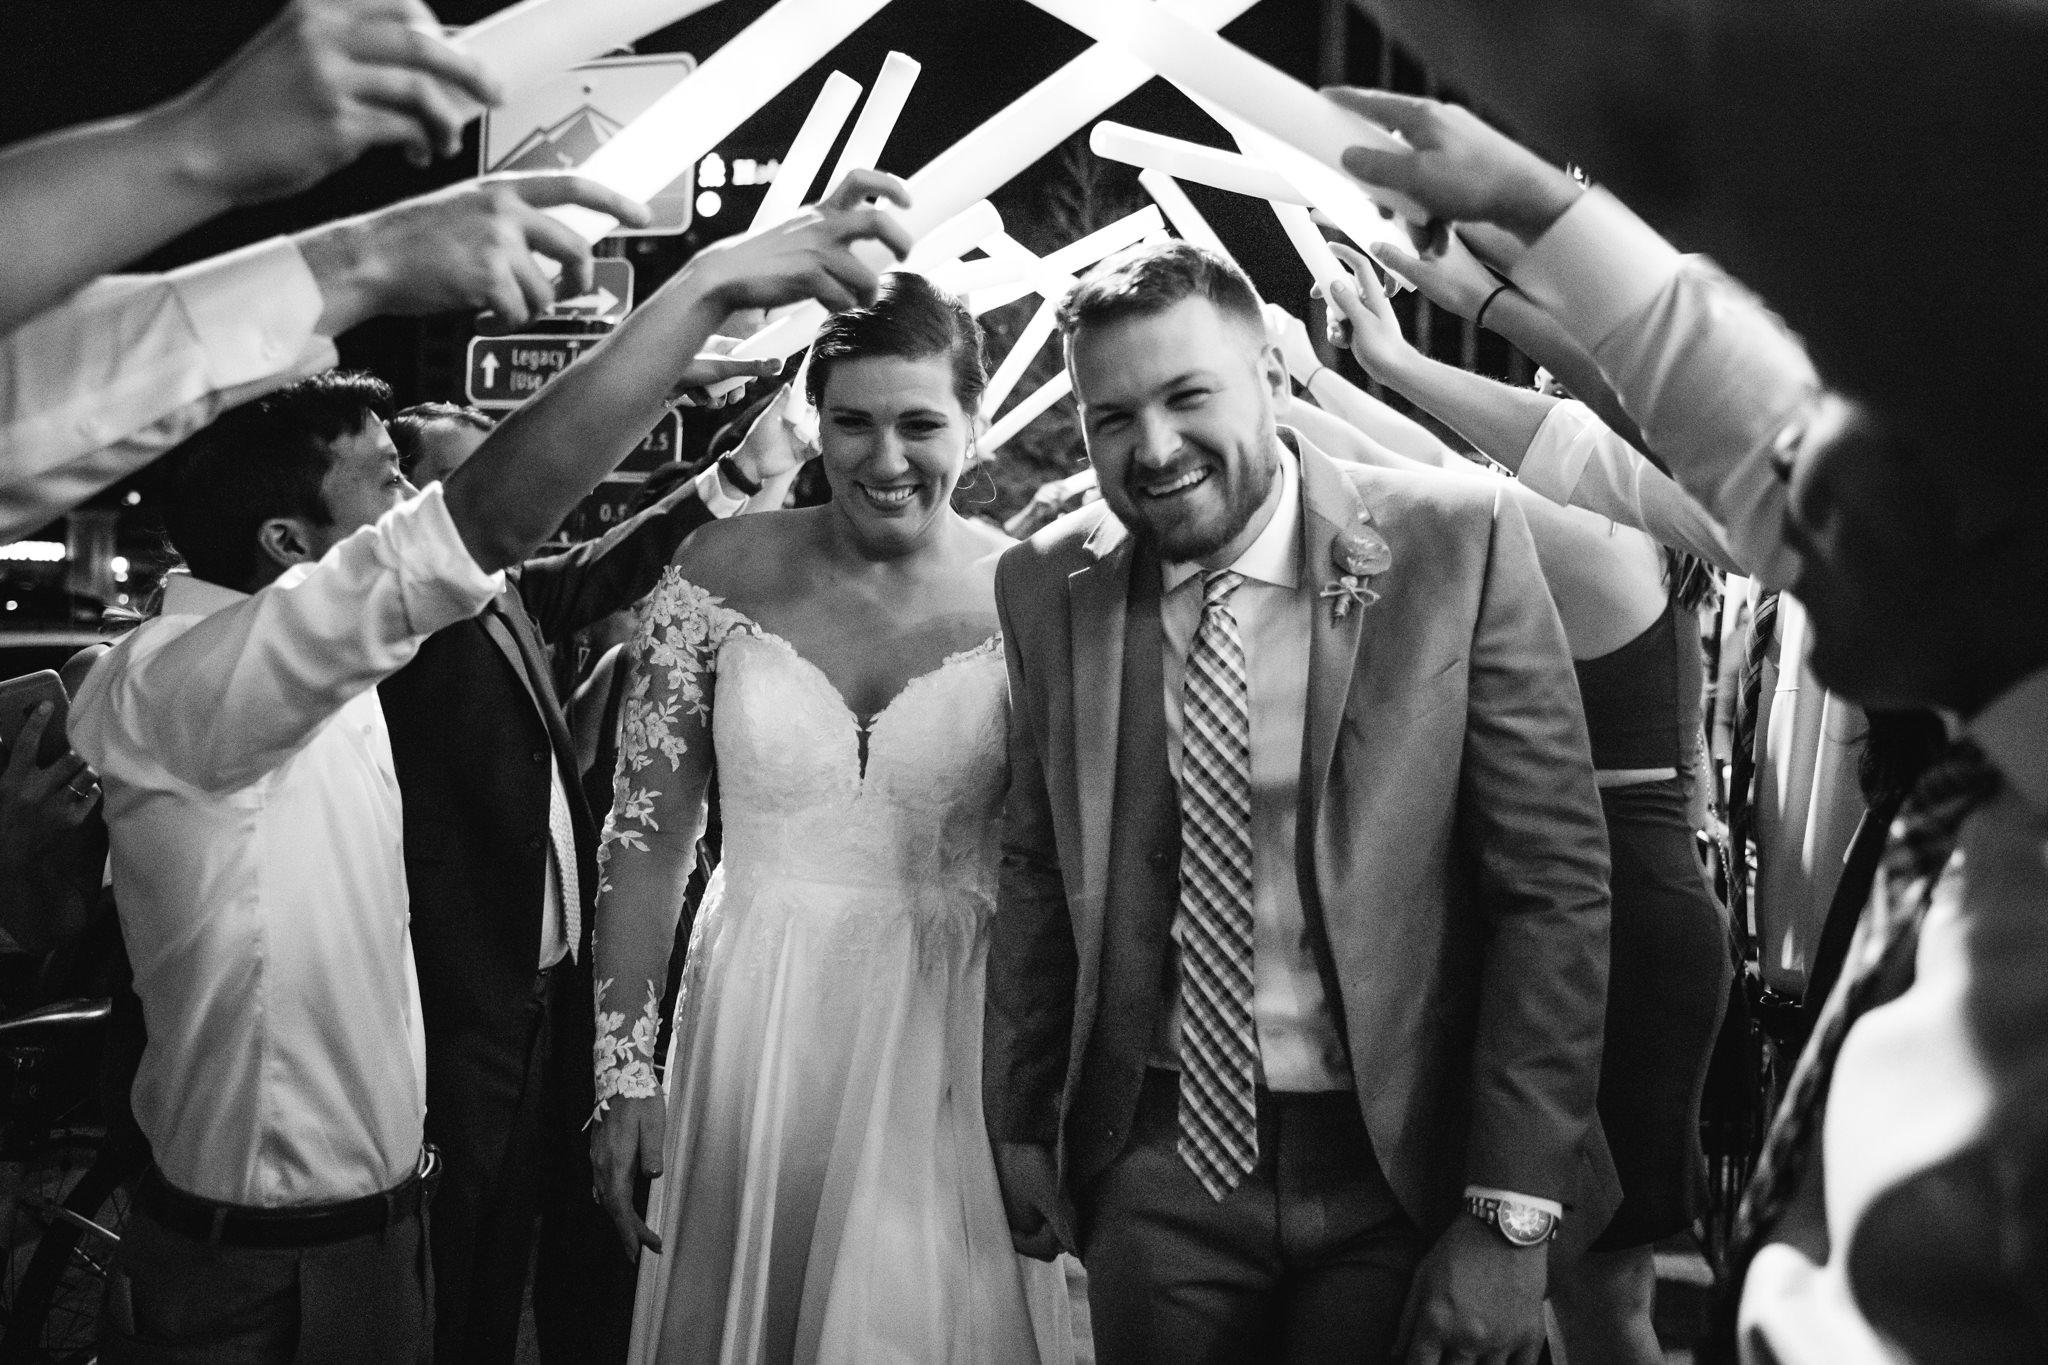 phantom-canyon-brewery-colorado-springs-wedding-photographer-221.jpg